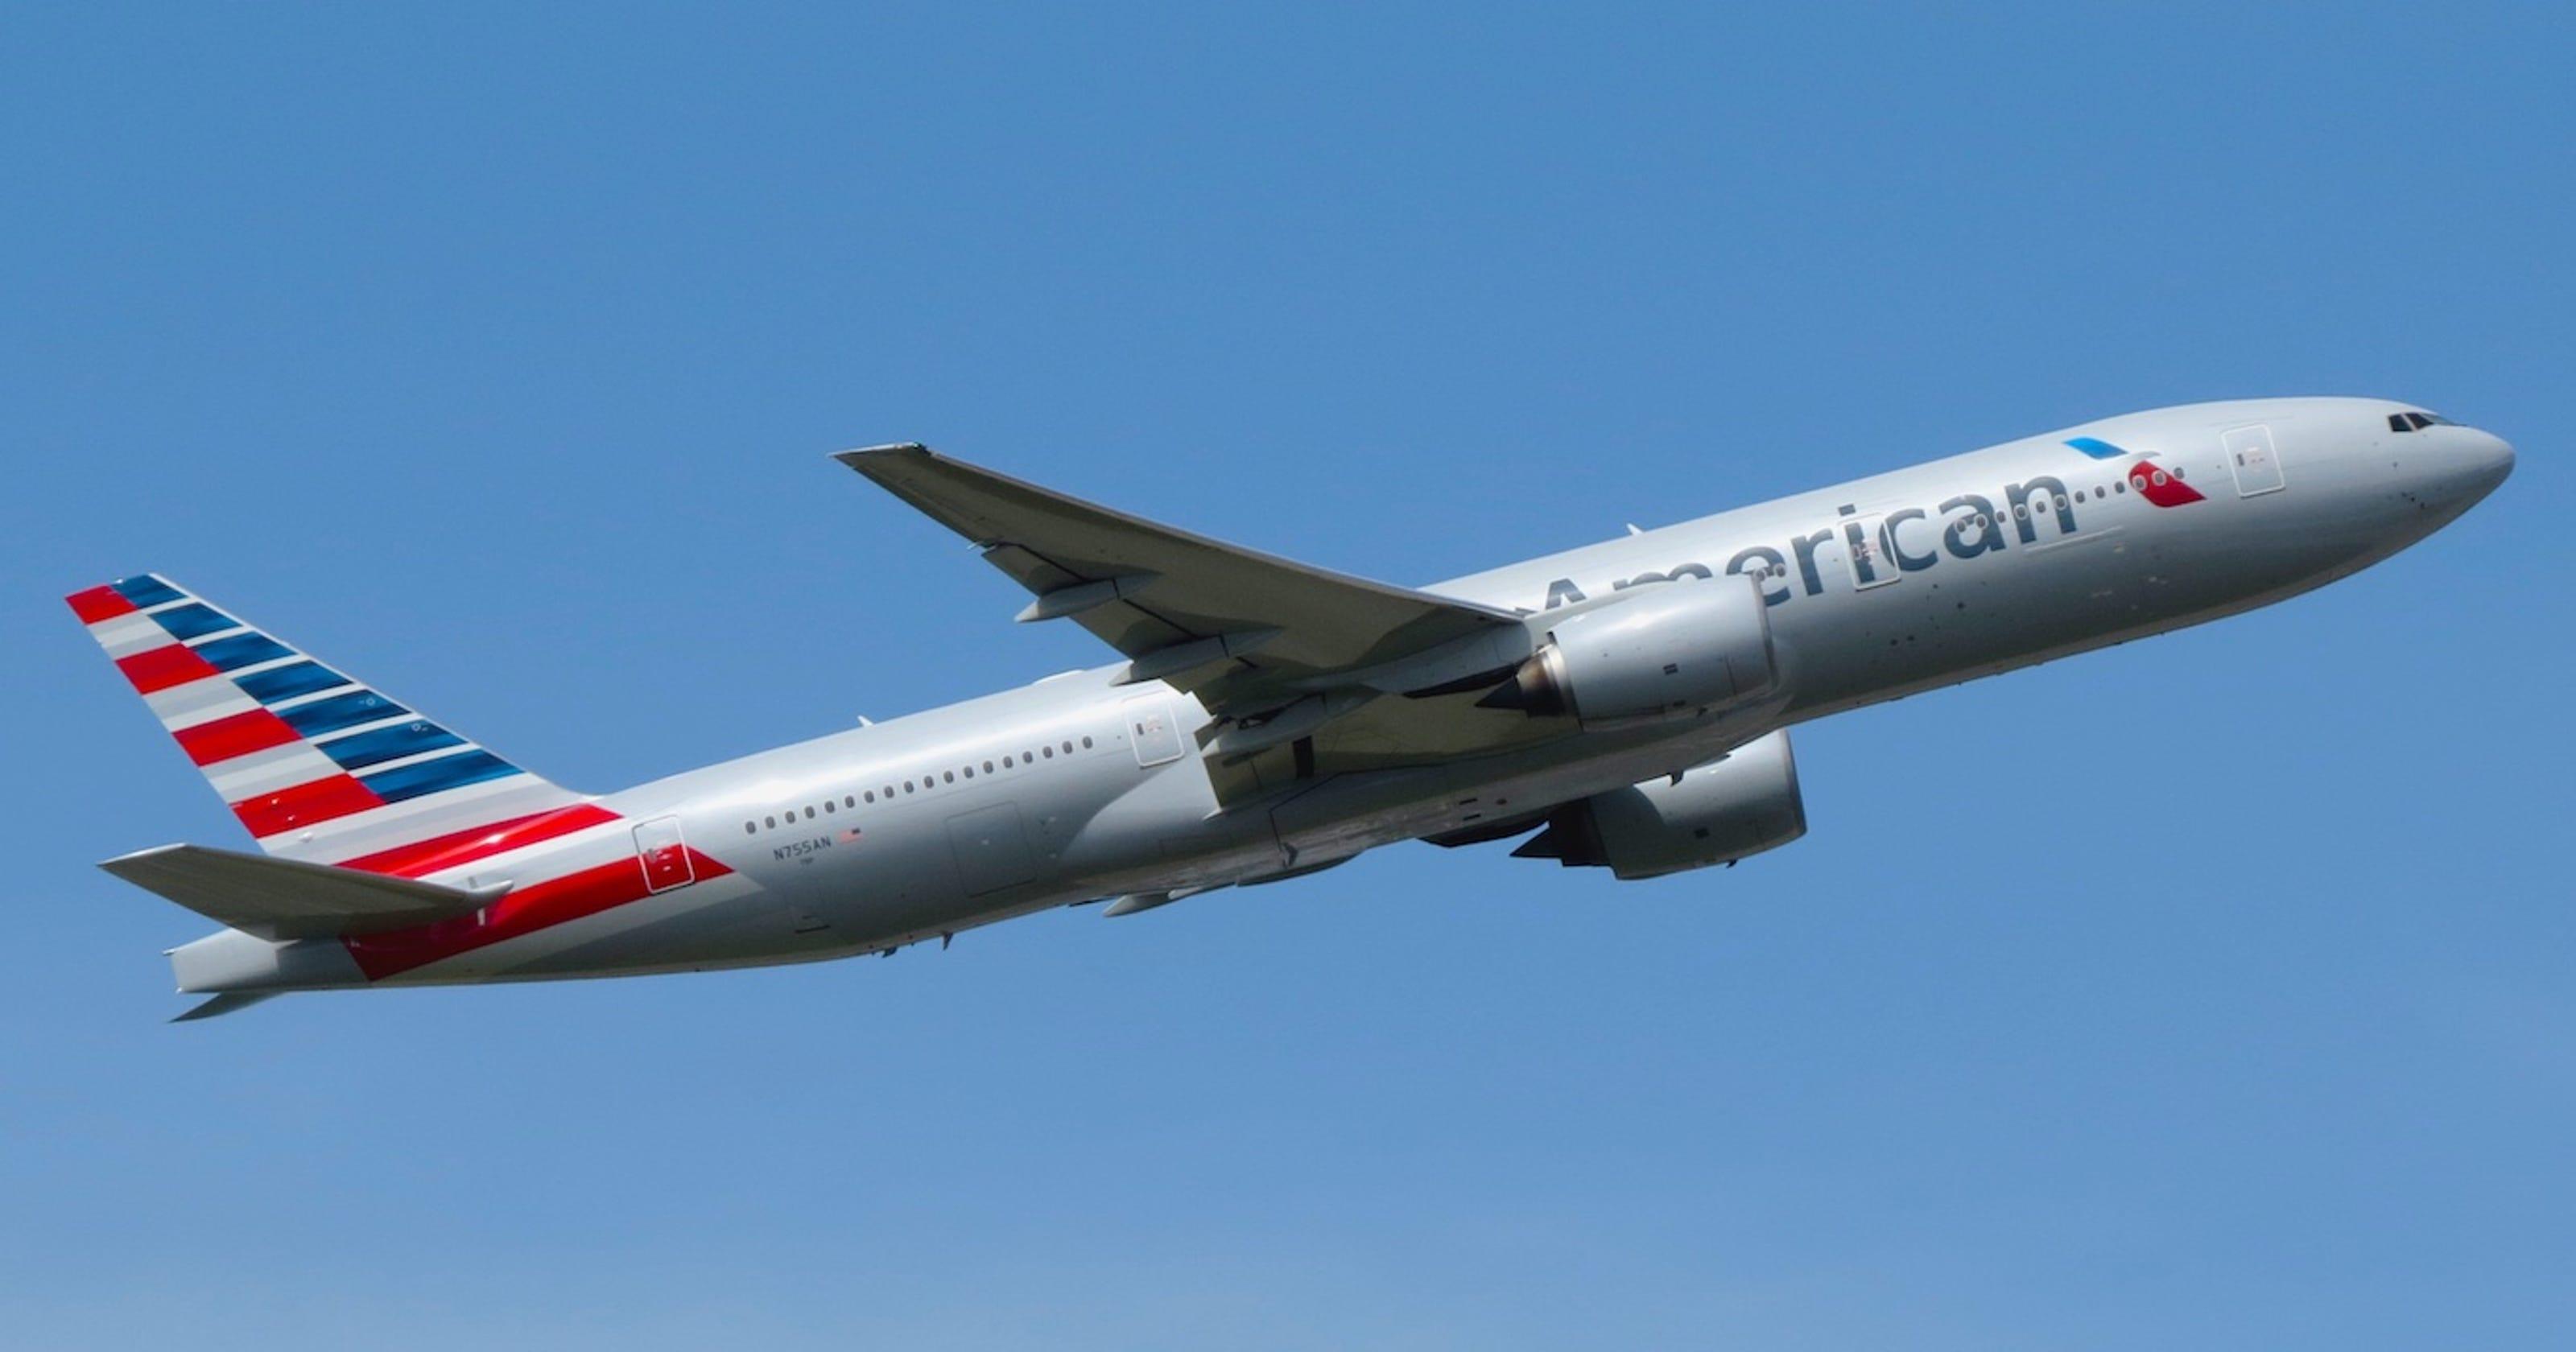 American Airlines halts flights to Venezuela after union warning